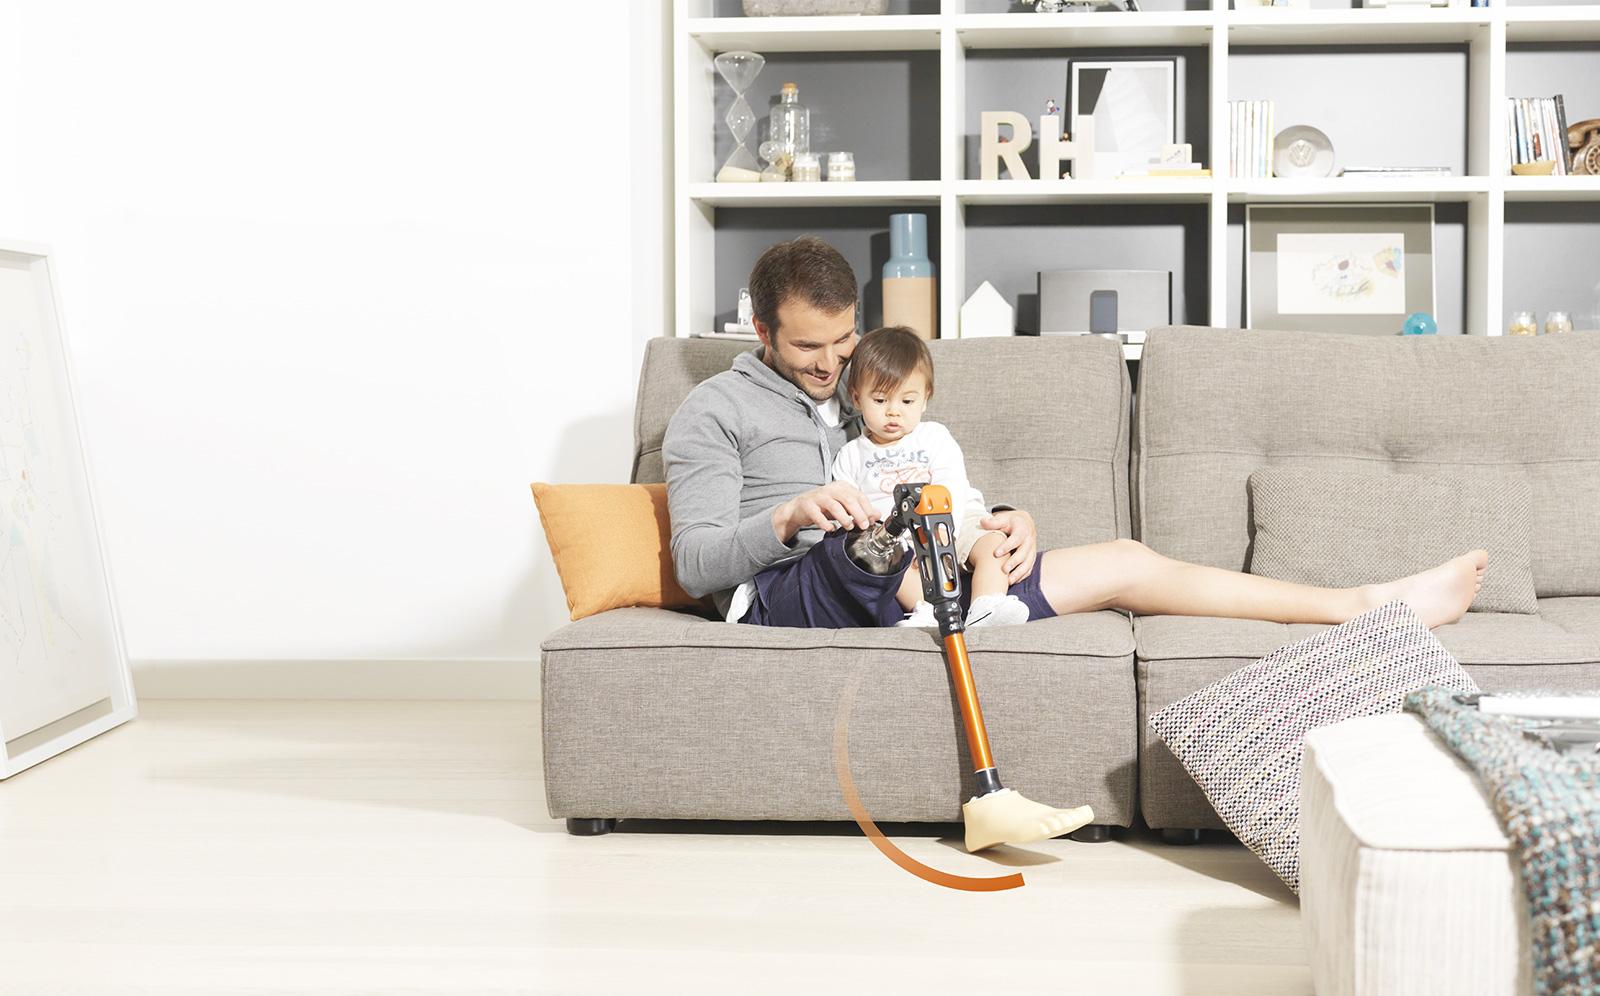 orliman-slider-home-prosthesis